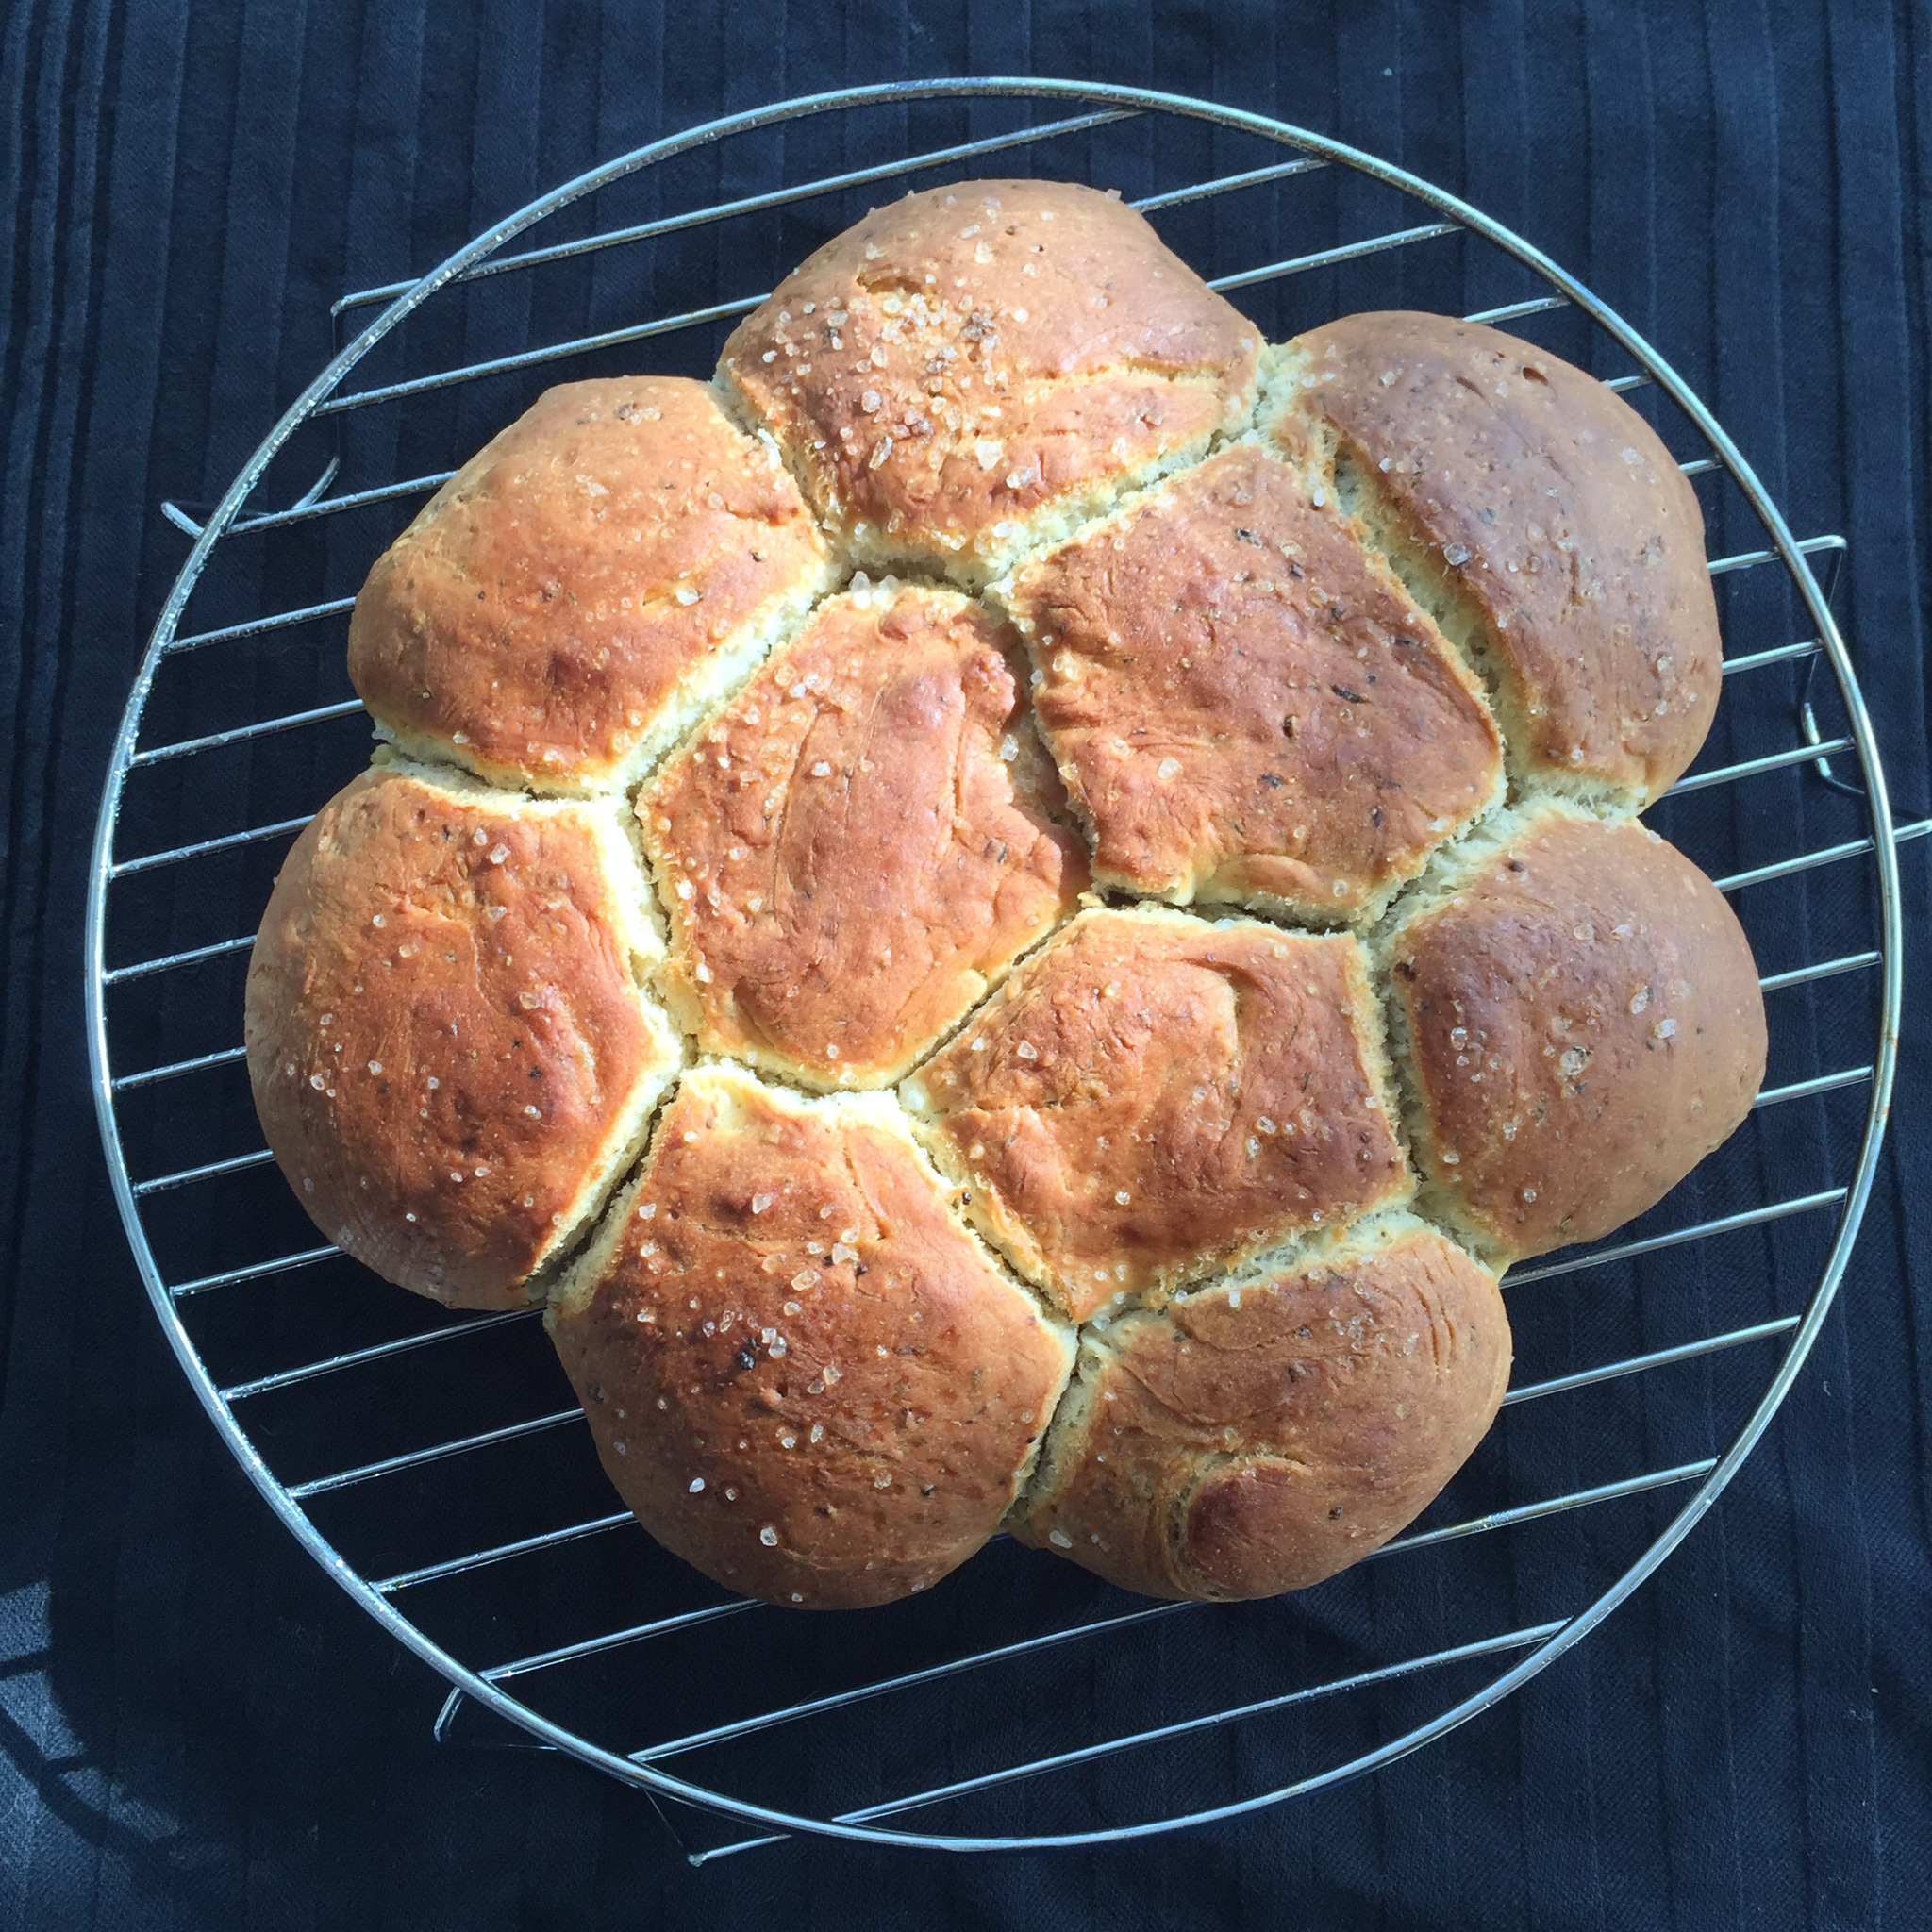 Breekbrood met kruiden en knoflook